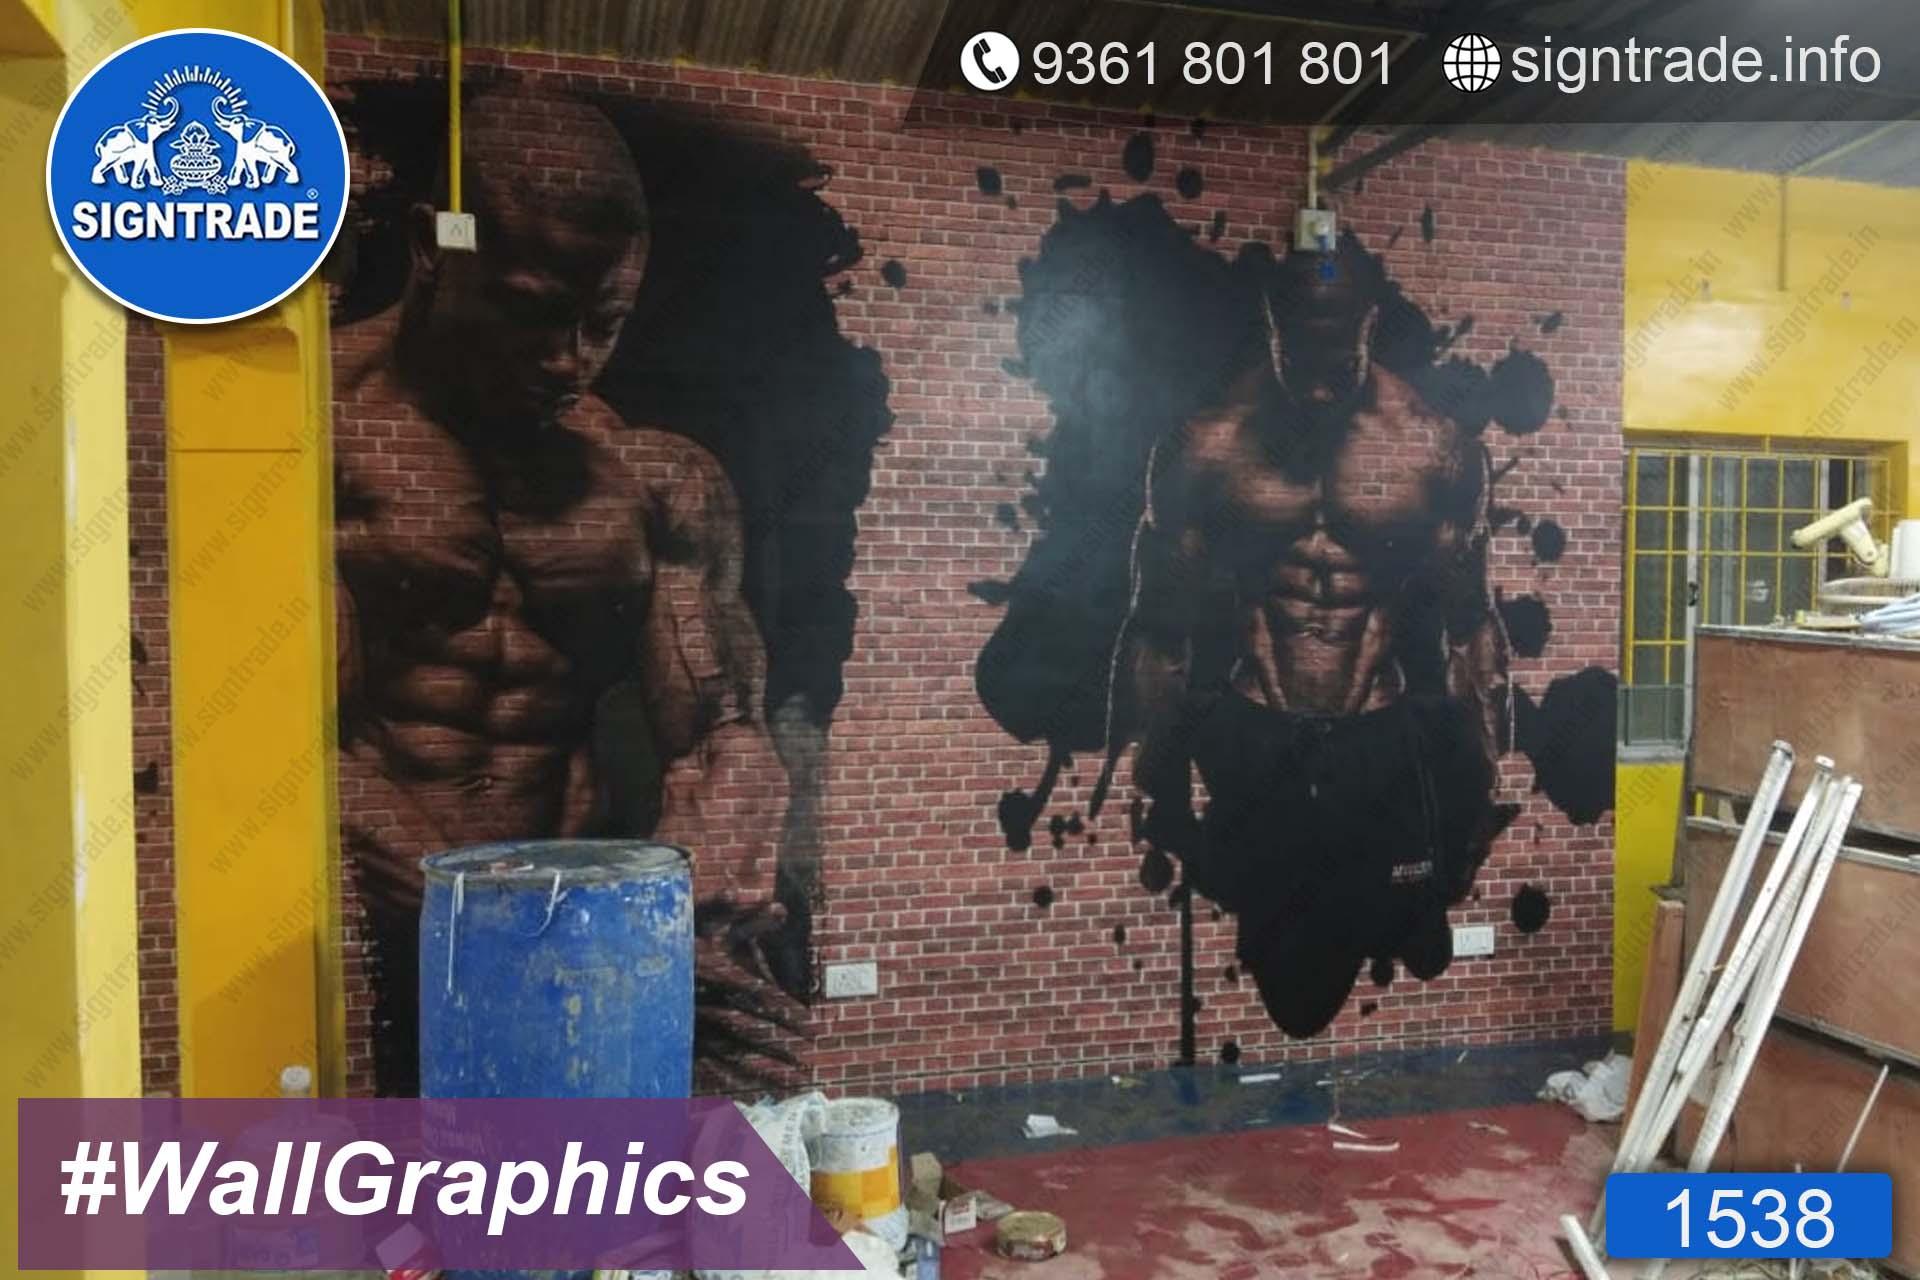 Global Gym - Chennai - SIGNTRADE - Wall Graphics - Vinyl Graphics on Wall - Digital Printing Services in Chennai